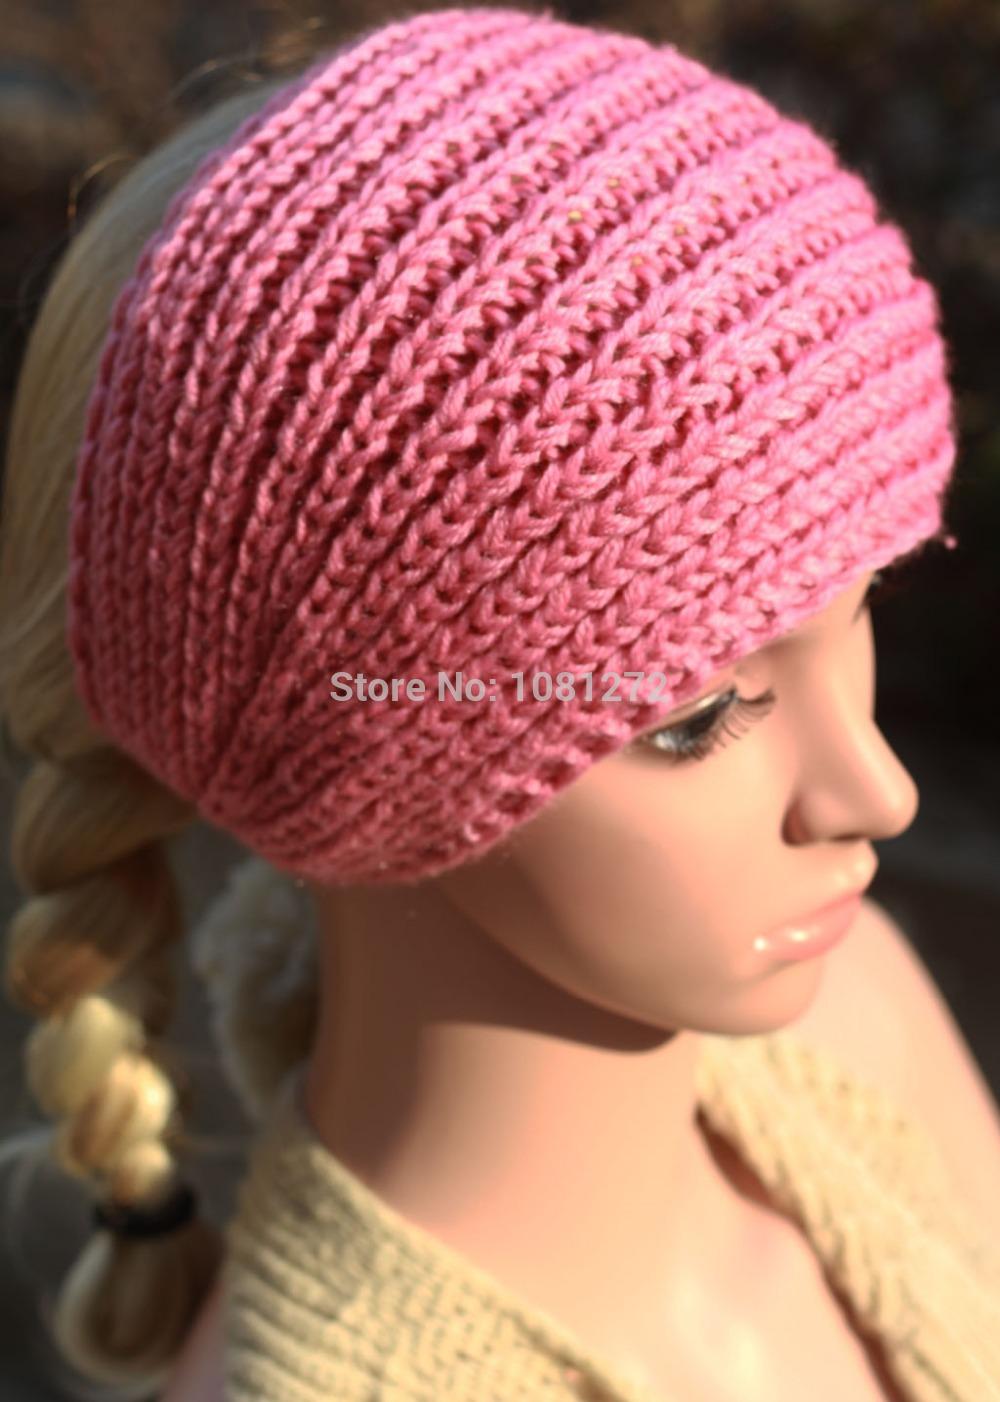 New pink Knit Headband,Knit Beanie,Cute Turban Headband,Earwarmer Head wrap,headband pattern,Fall and winter hair accessory(China (Mainland))